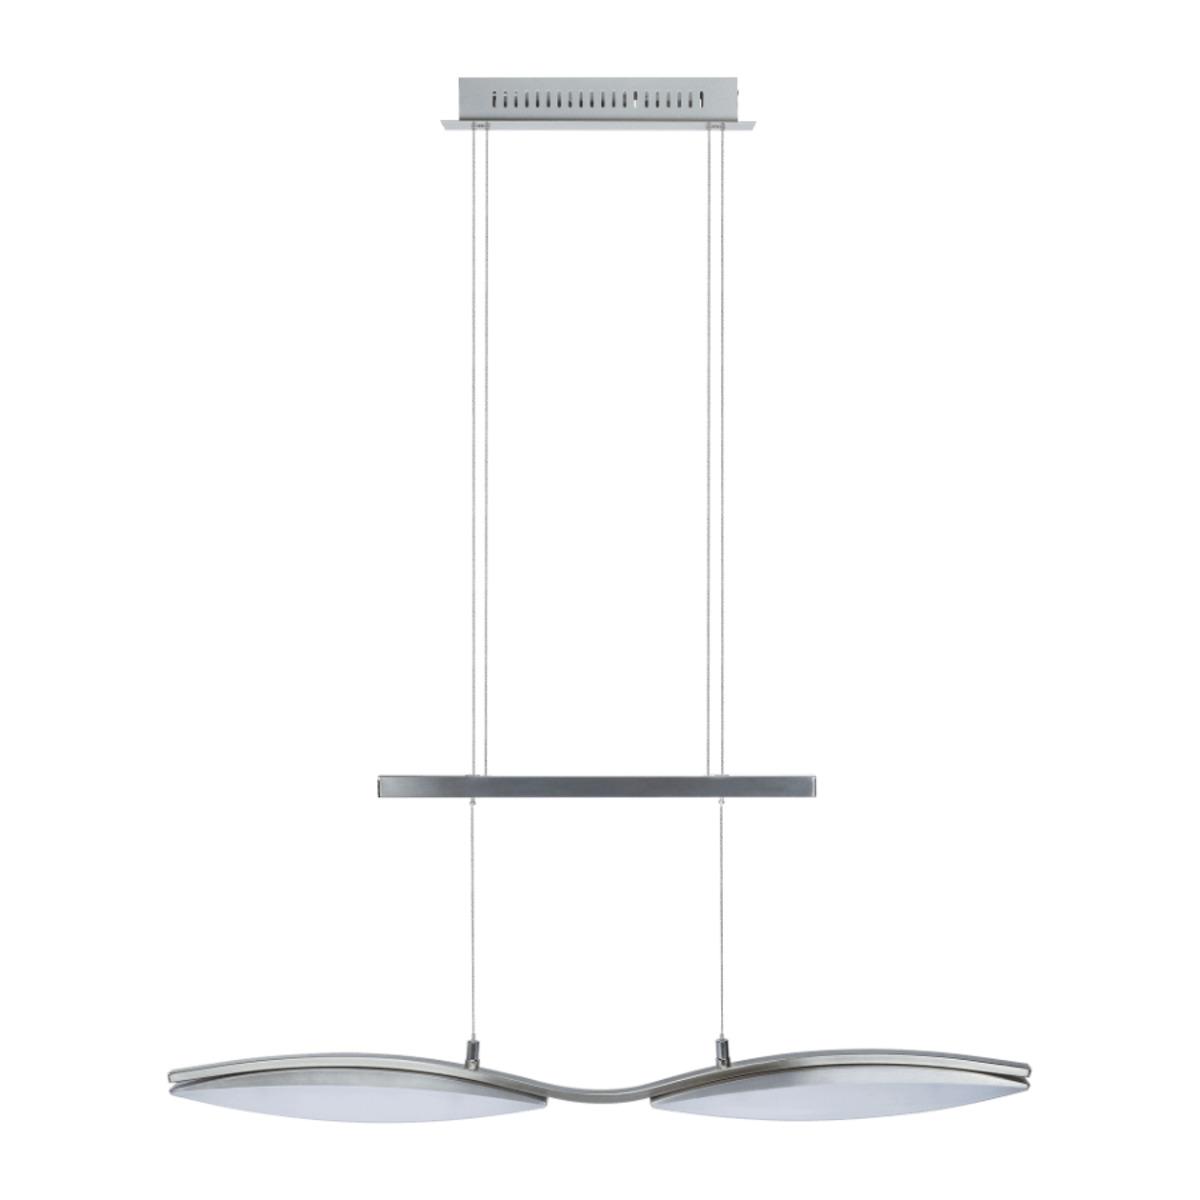 Bild 4 von LIGHTZONE     LED-Pendelleuchte